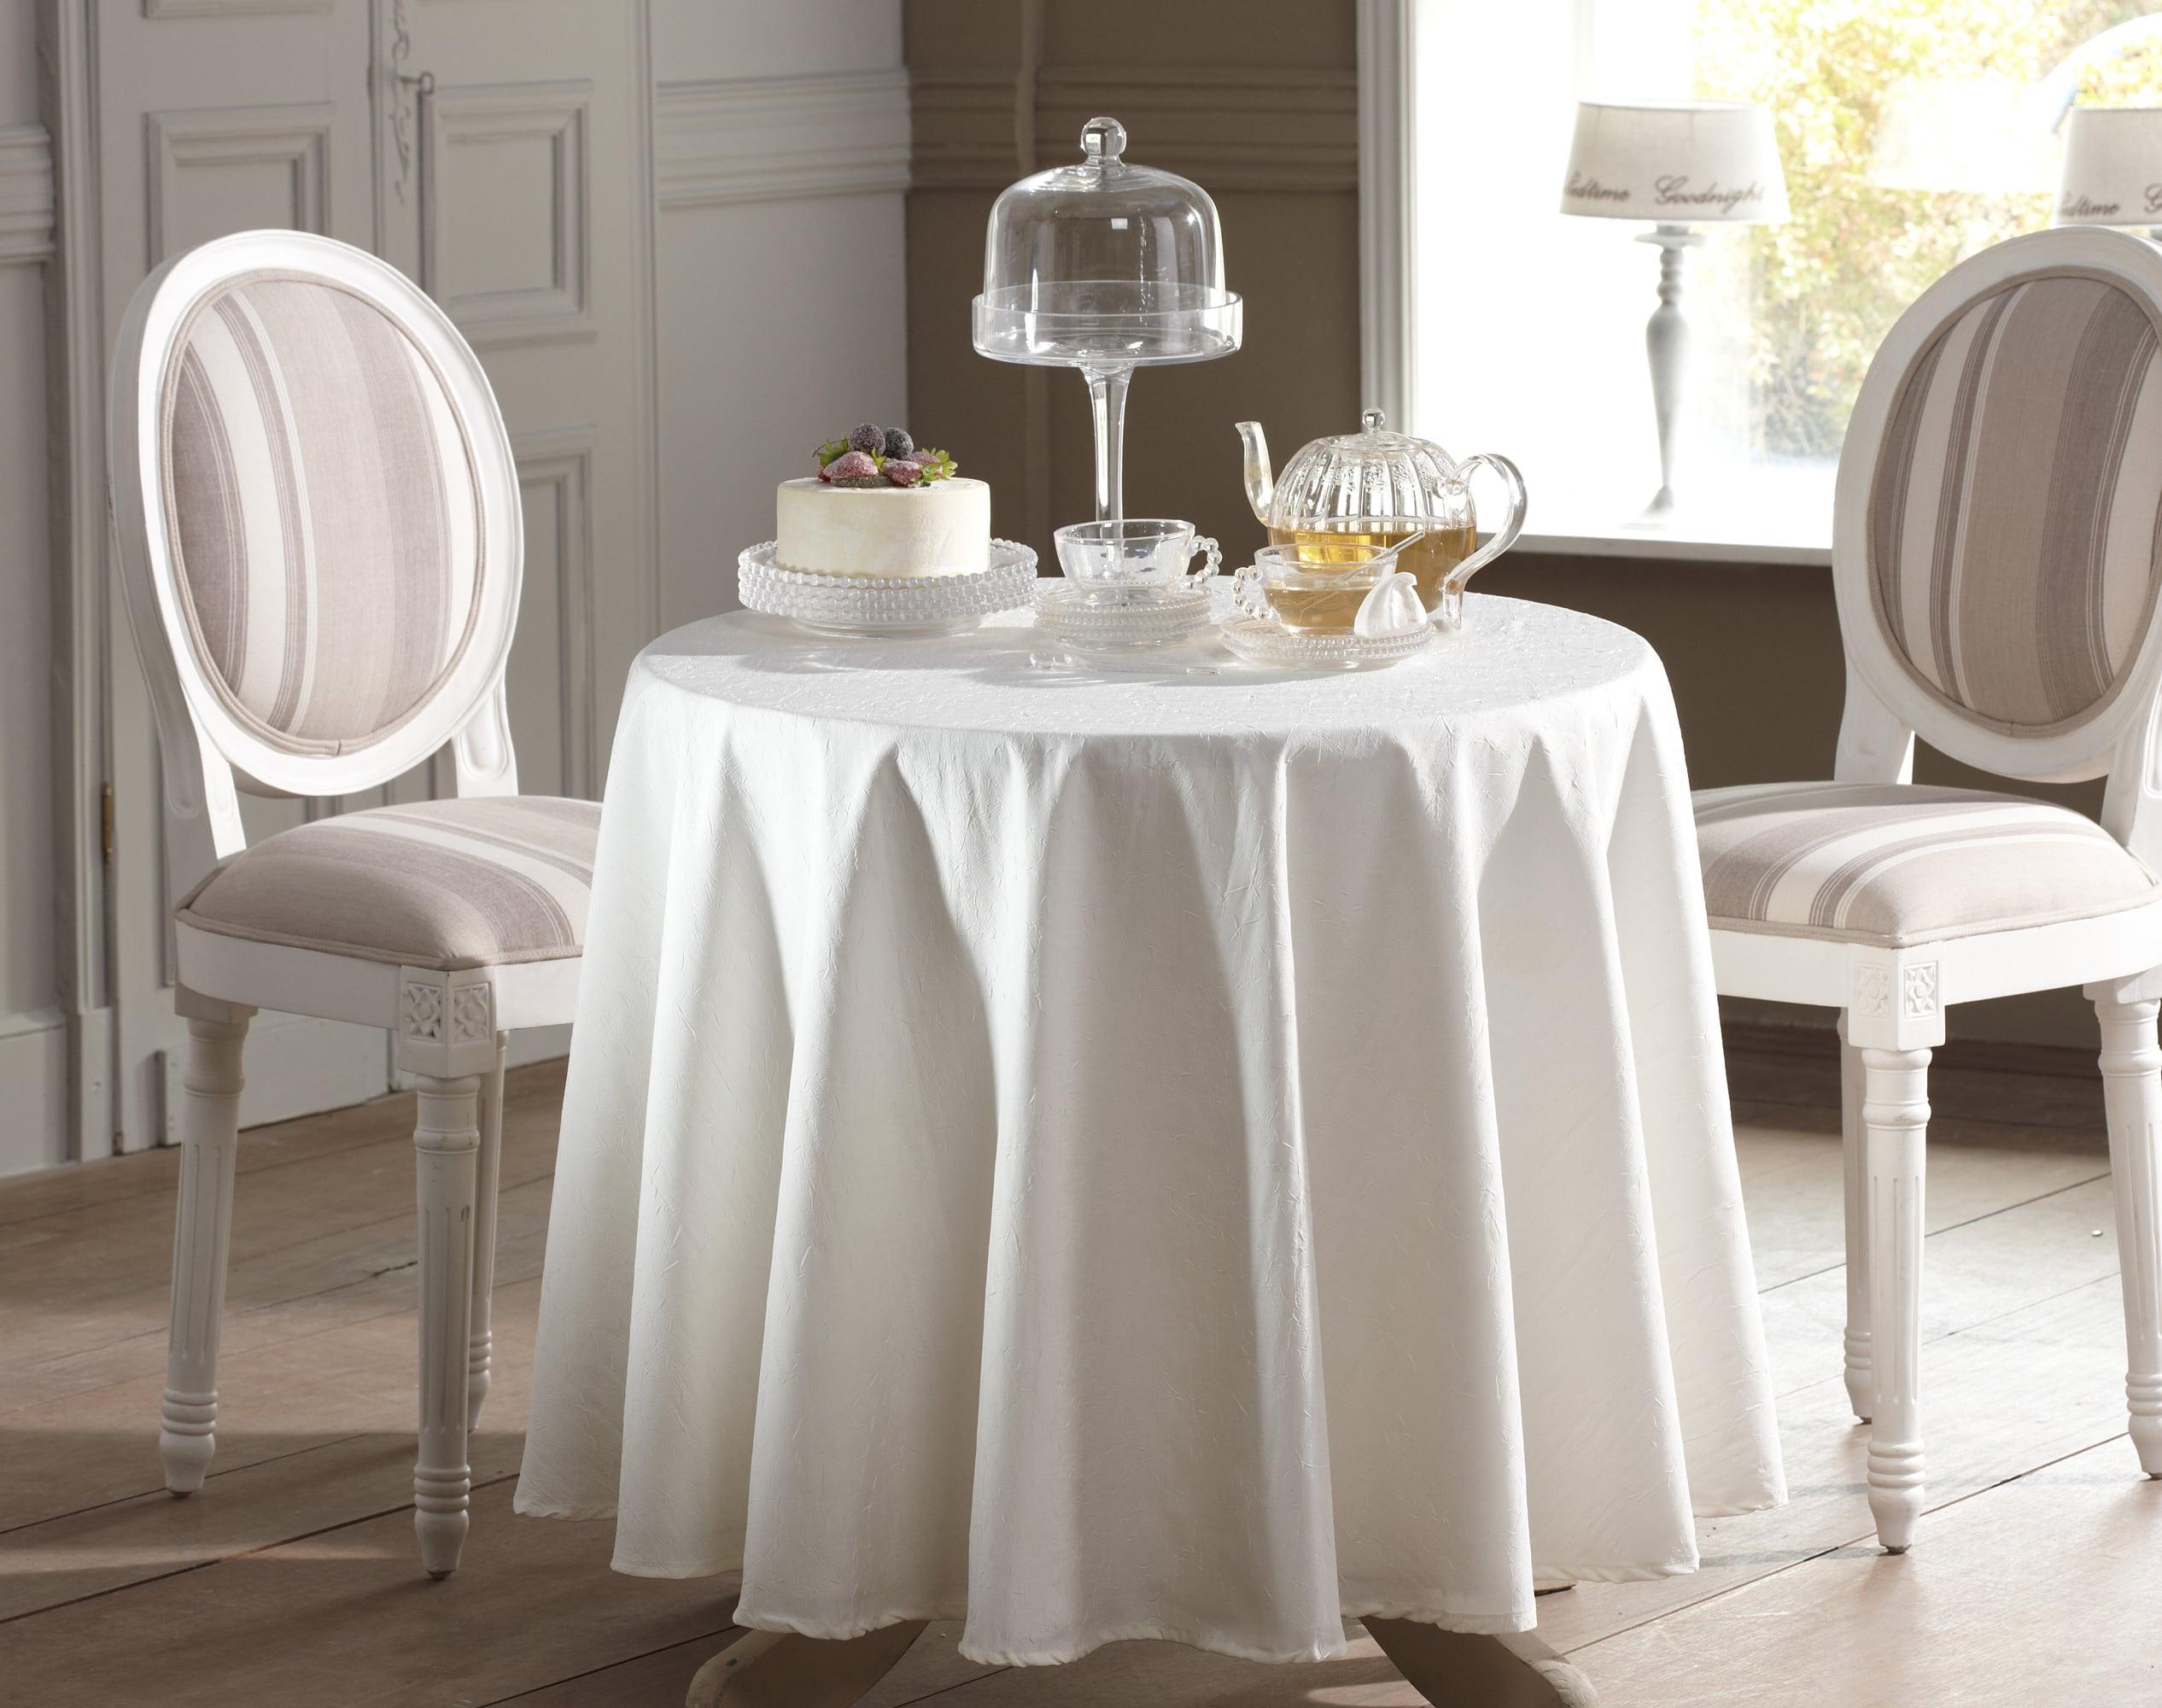 Nappe Ronde blanc en polyester 235x235